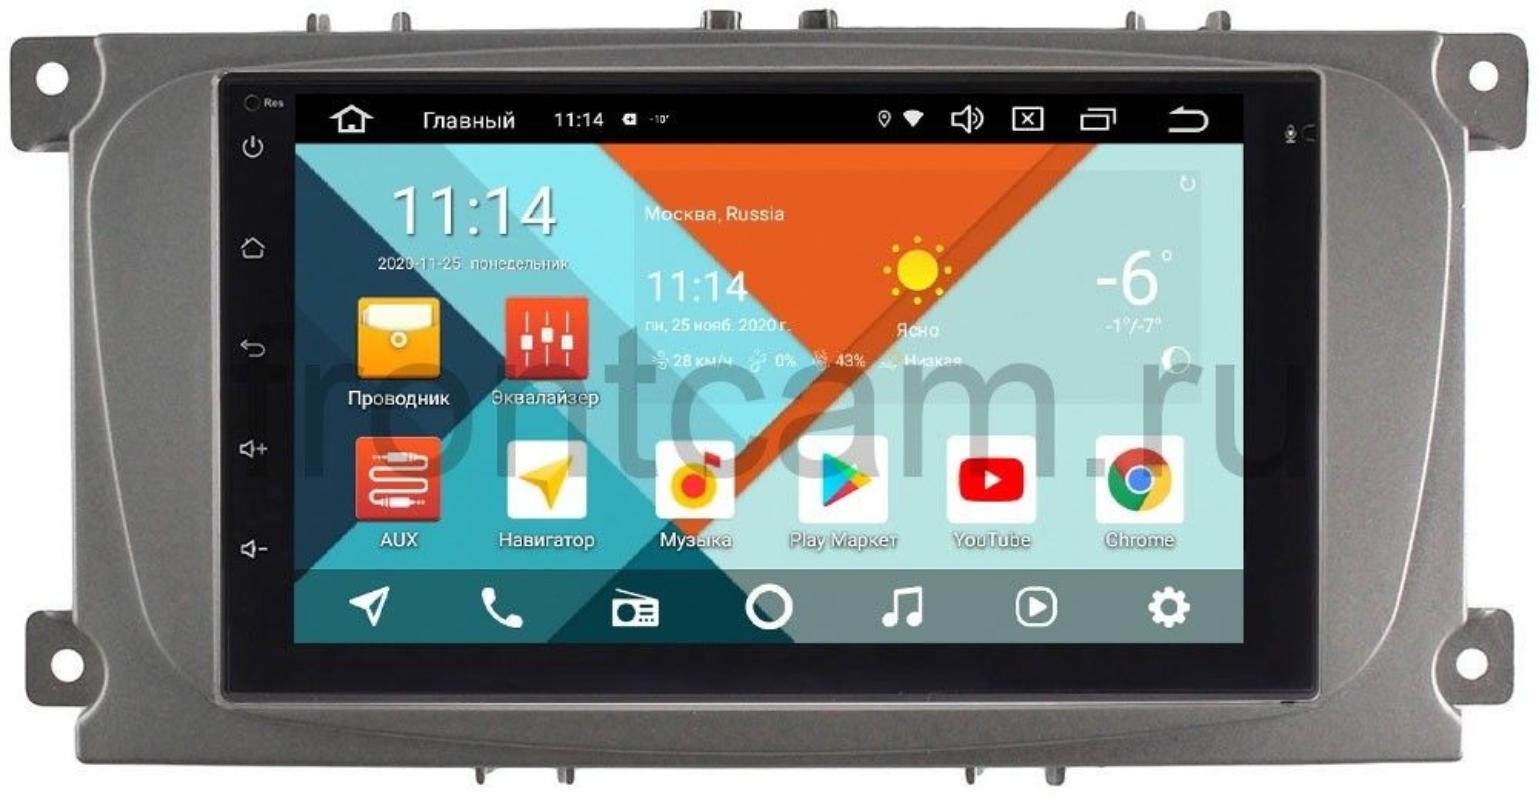 Штатная магнитола Ford Focus, C-Max, Mondeo Wide Media KS7001QR-3/32-RP-FRCMD-54 на Android 10 (DSP CarPlay 4G-SIM) (+ Камера заднего вида в подарок!)